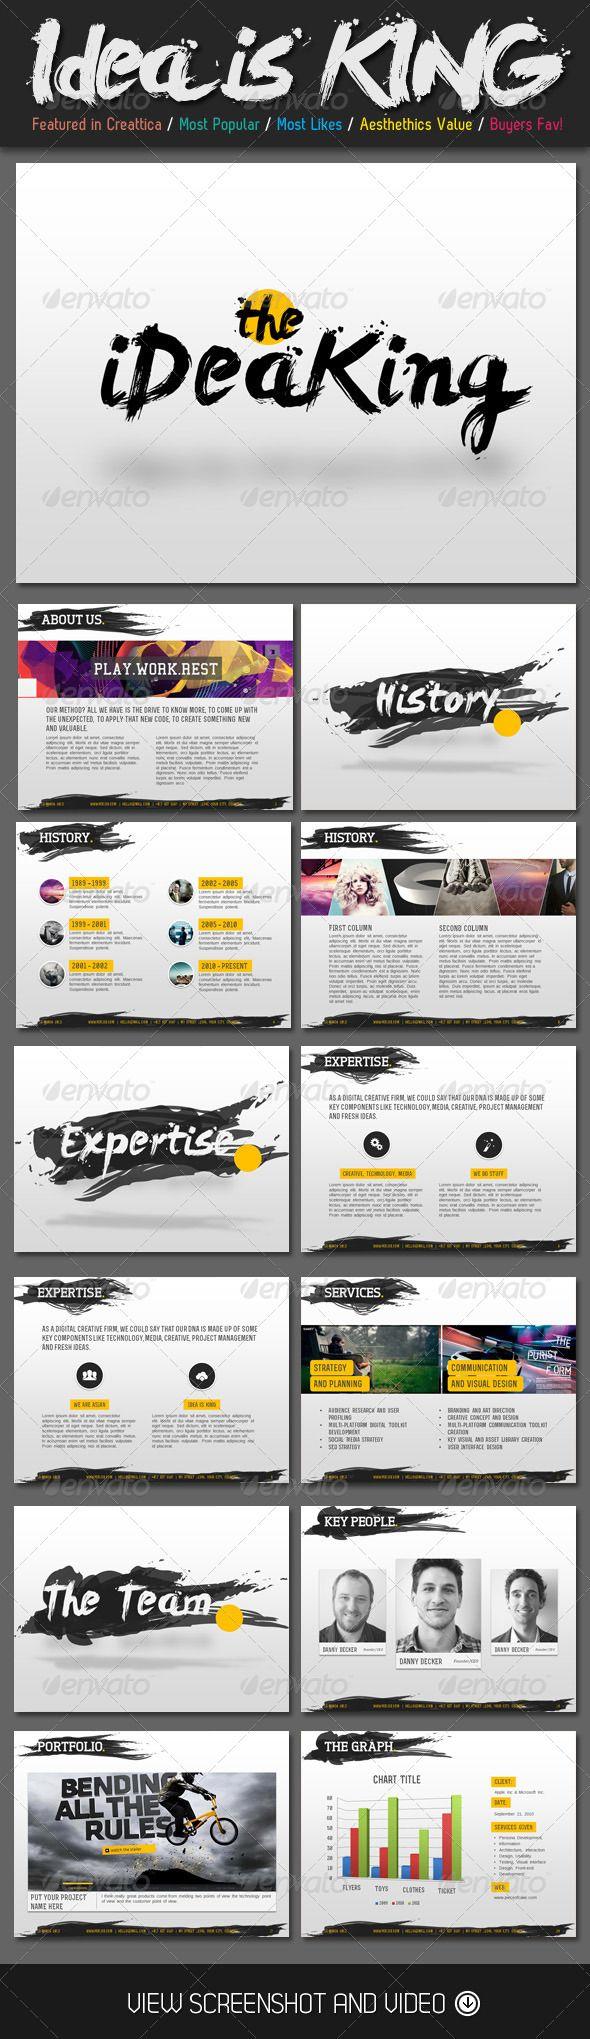 Presentation templates ideas is king creative powerpoint template presentation templates ideas is king creative powerpoint template graphicriver design presentation toneelgroepblik Gallery